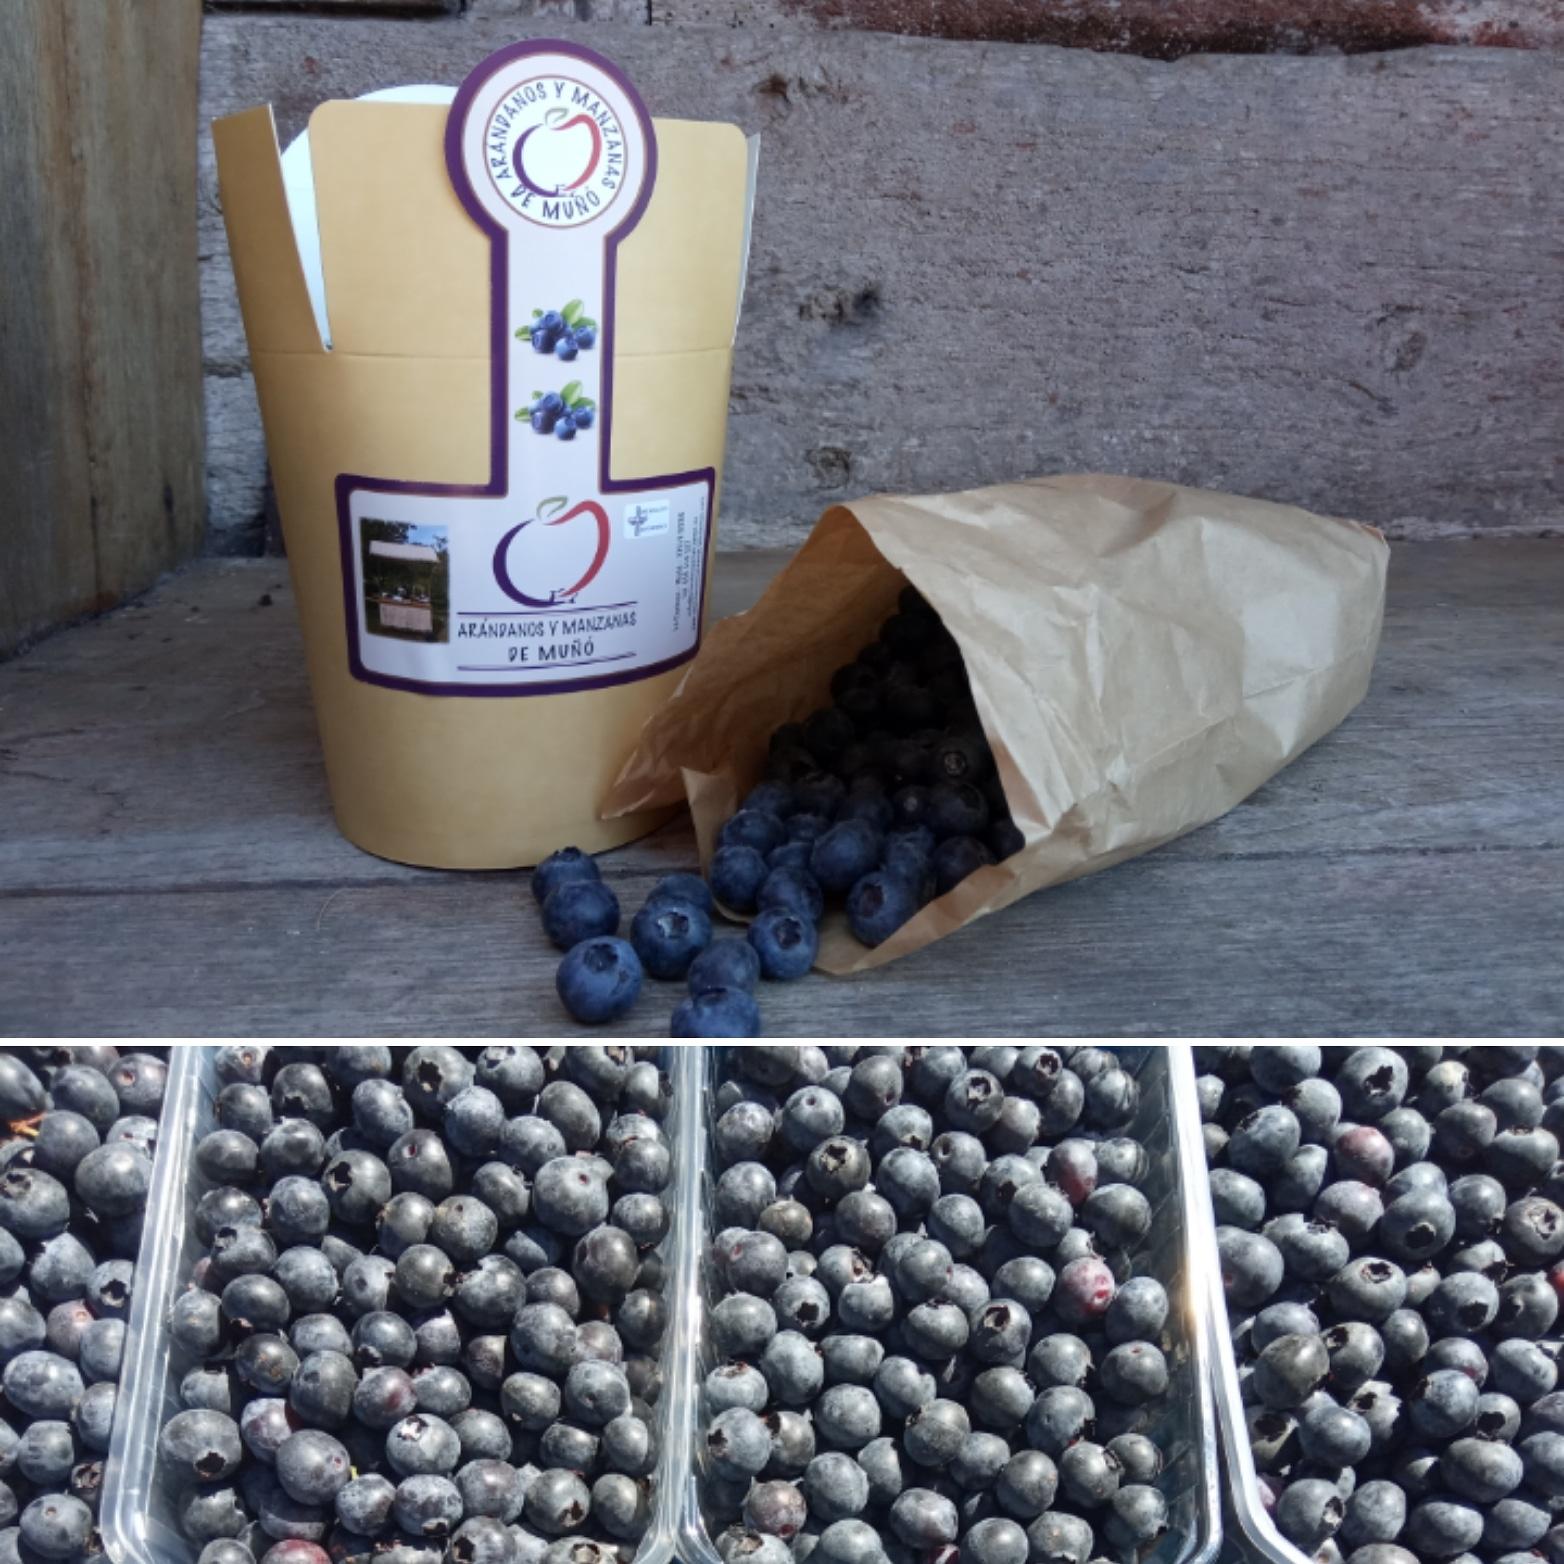 Arándanos frescos (1,5 kg)